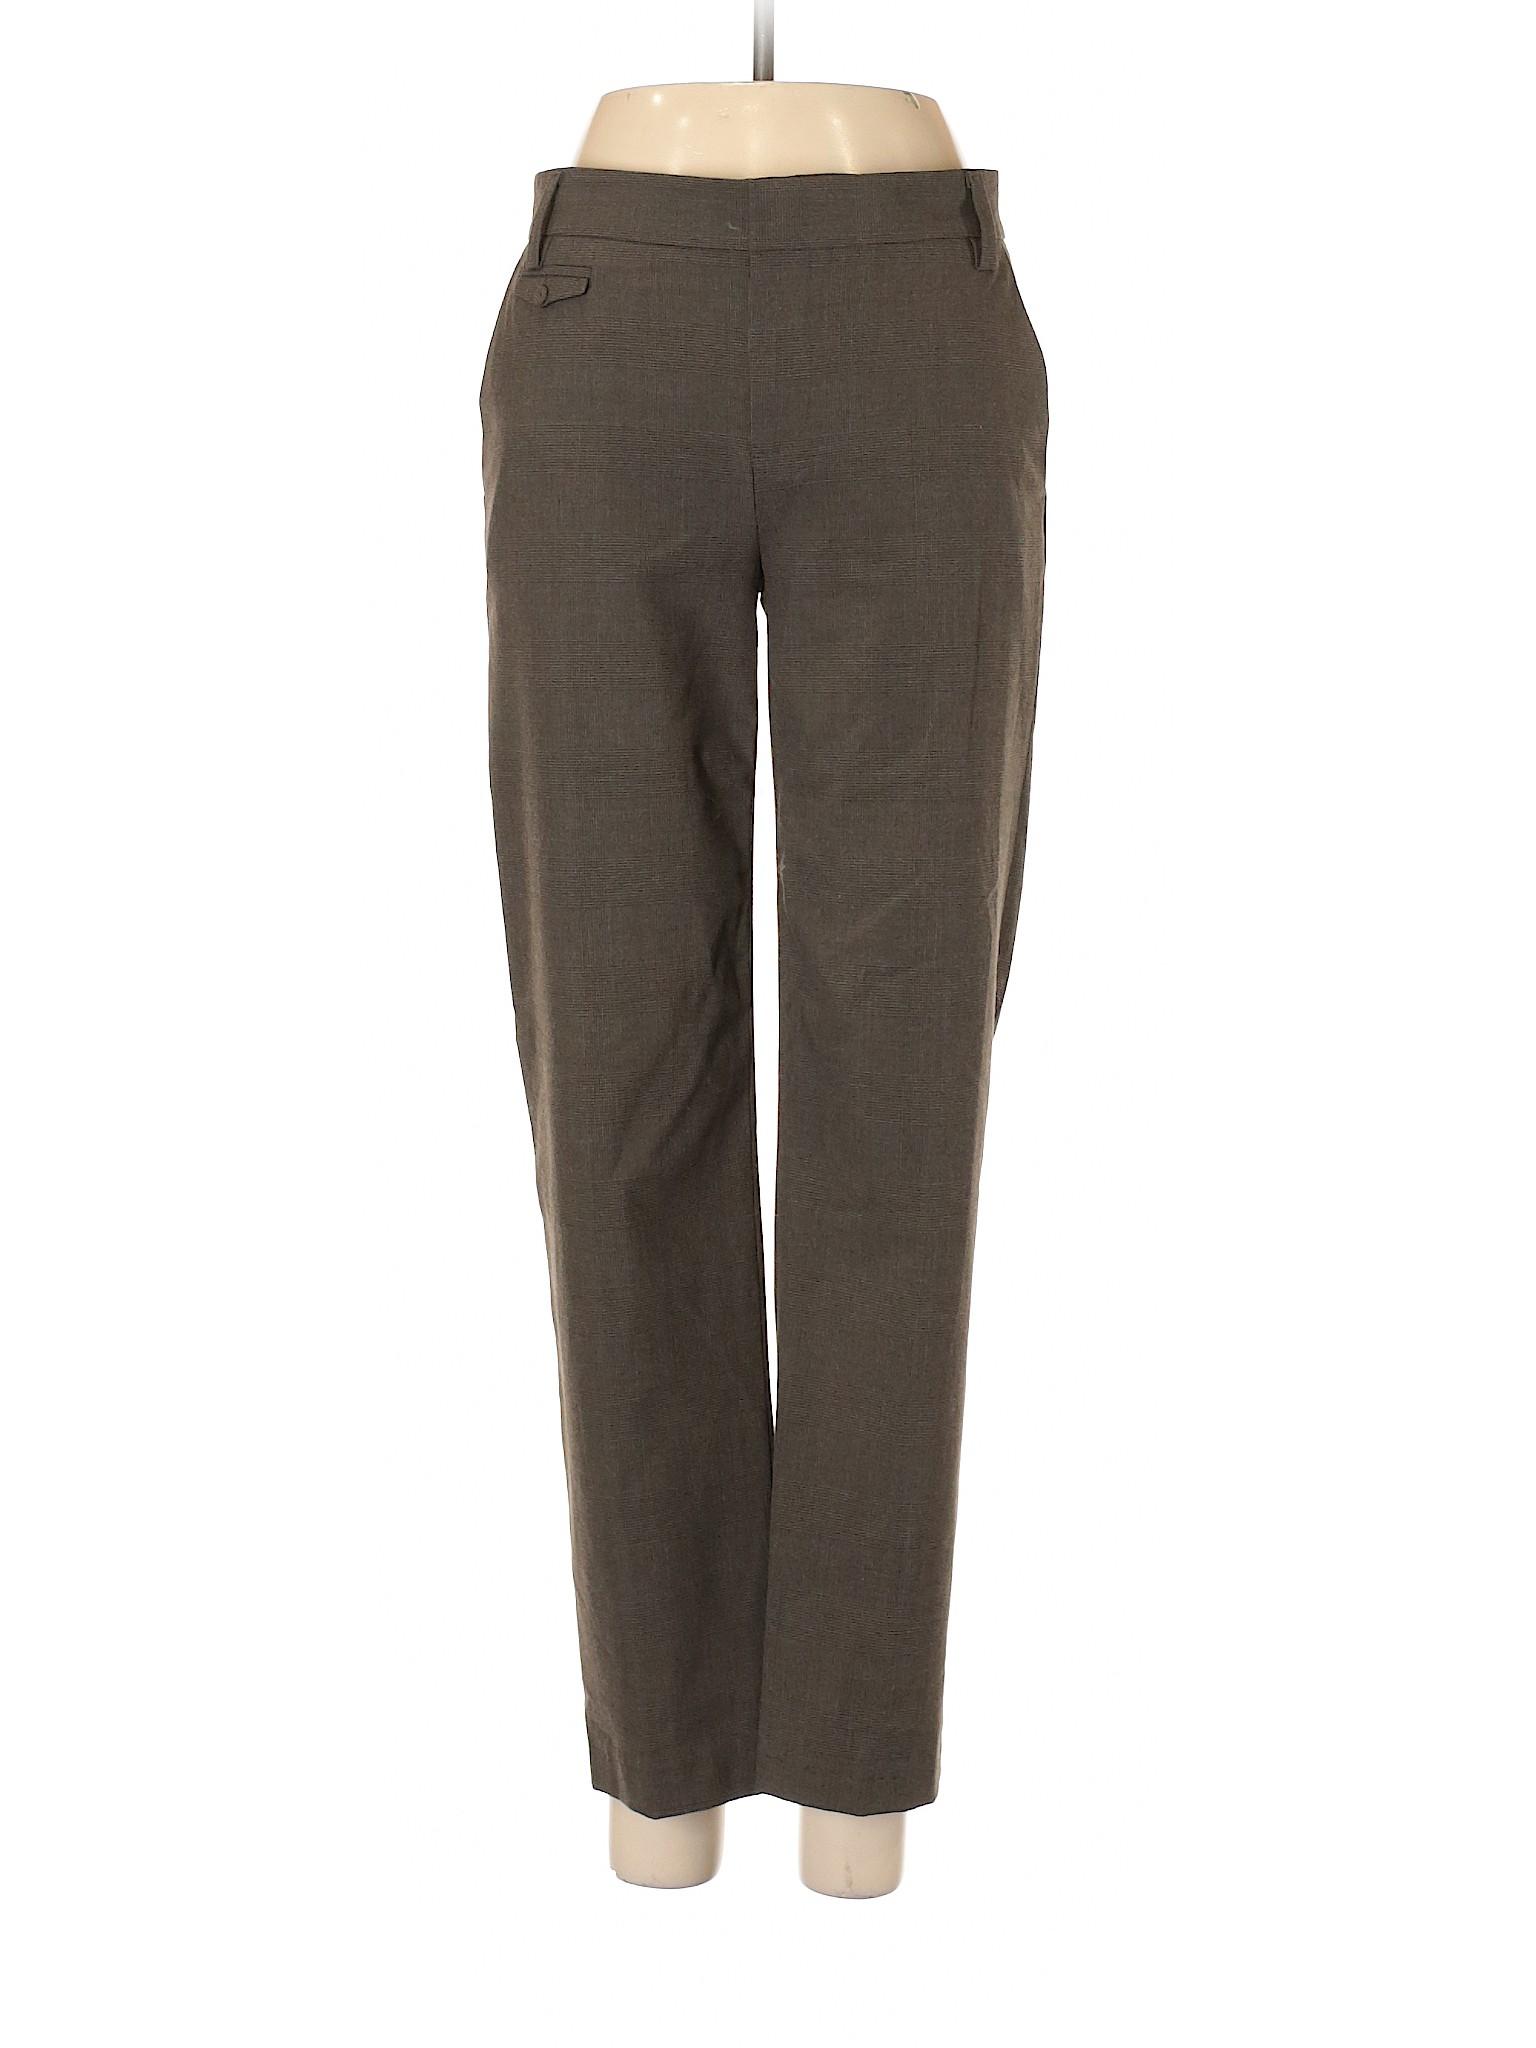 Pants Gap Gap Boutique Dress Dress Pants leisure leisure Dress Boutique Boutique Pants Boutique Gap leisure qZwYAY